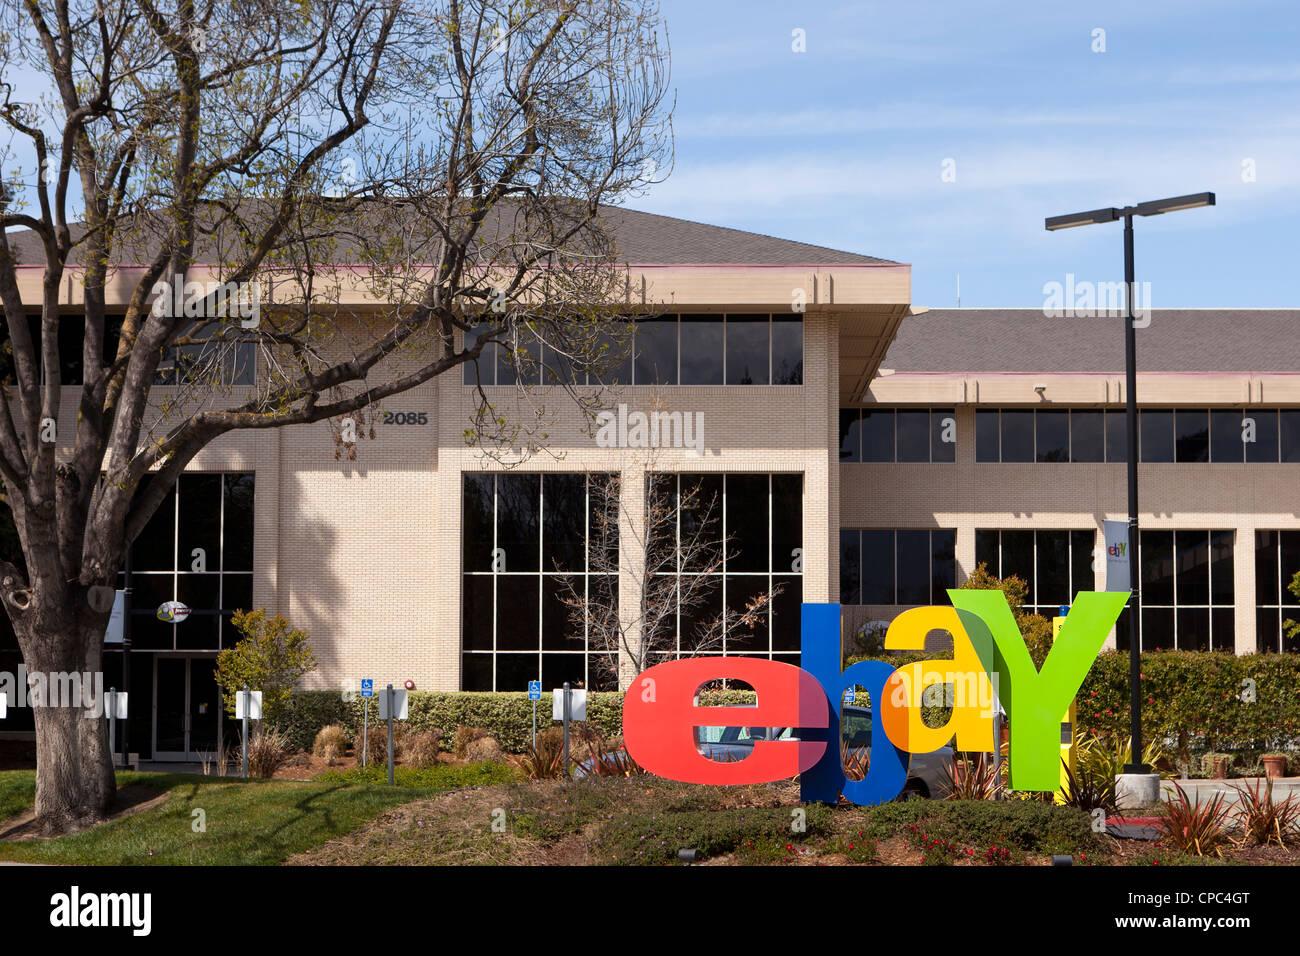 Ebay Headquarters Building San Jose California Stock Photo Alamy